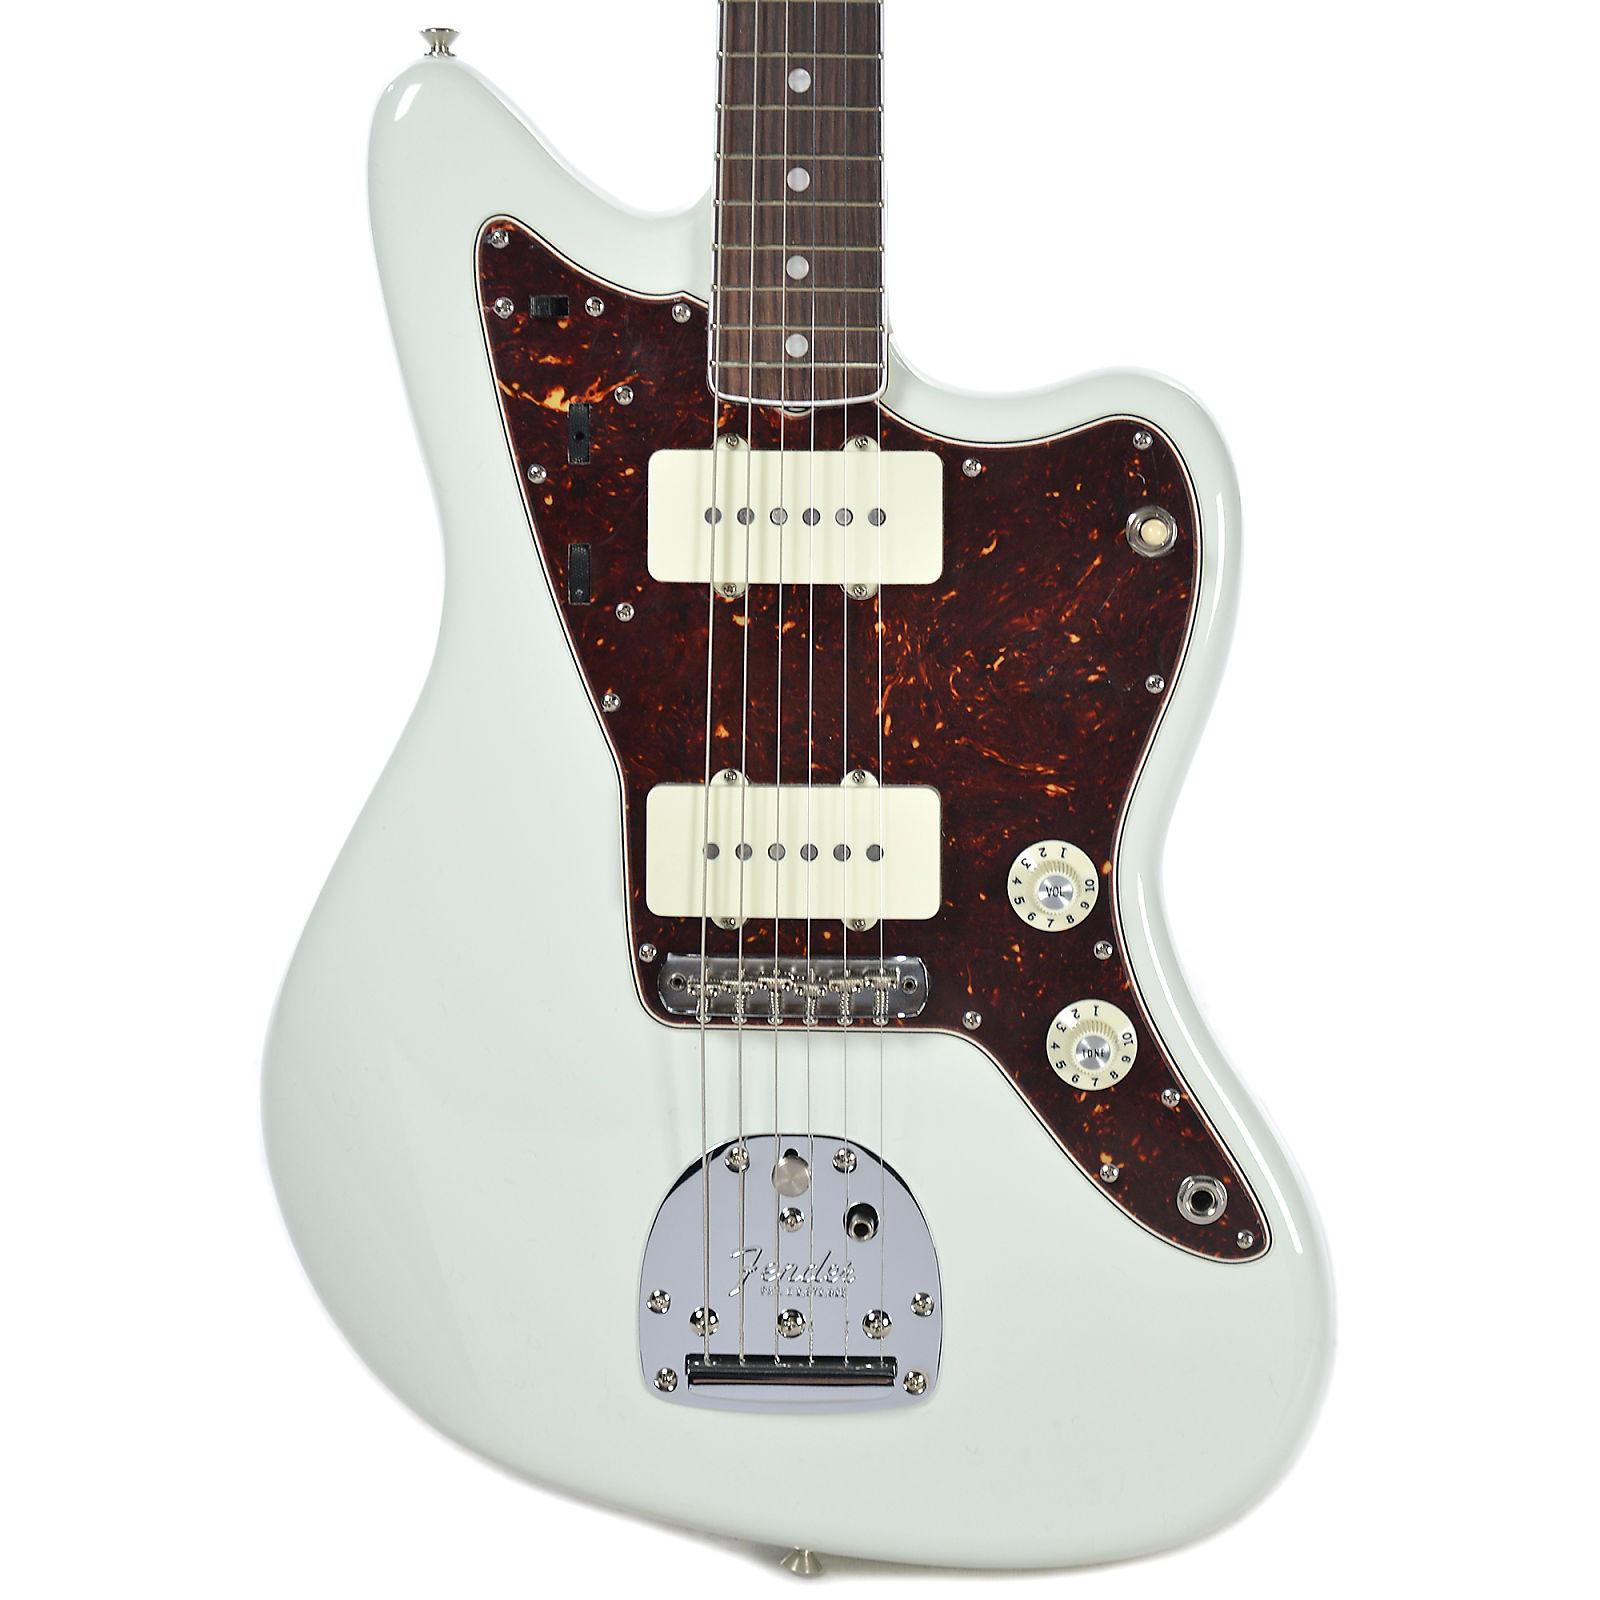 Fender American Vintage '65 Jazzmaster RW Olympic White w/Matching Headstock